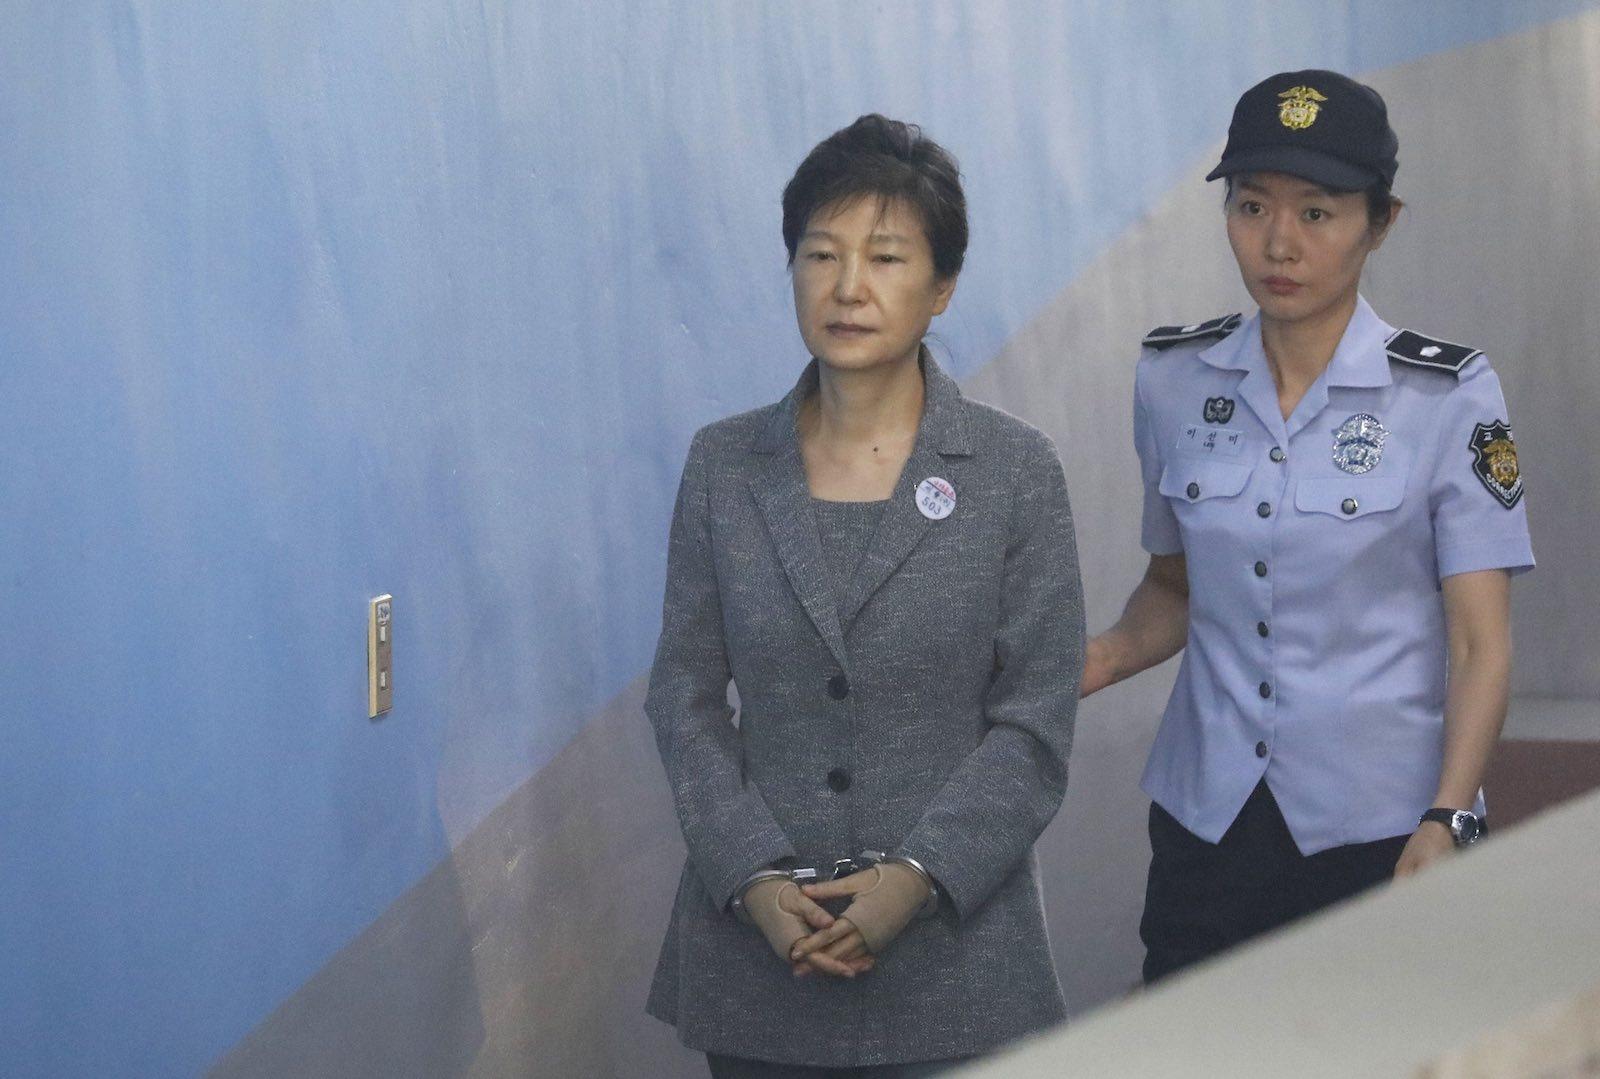 Former South Korean leader Park Geun-hye arrives at court in August 2017 (Photo: Kim Hong-ji via Getty)